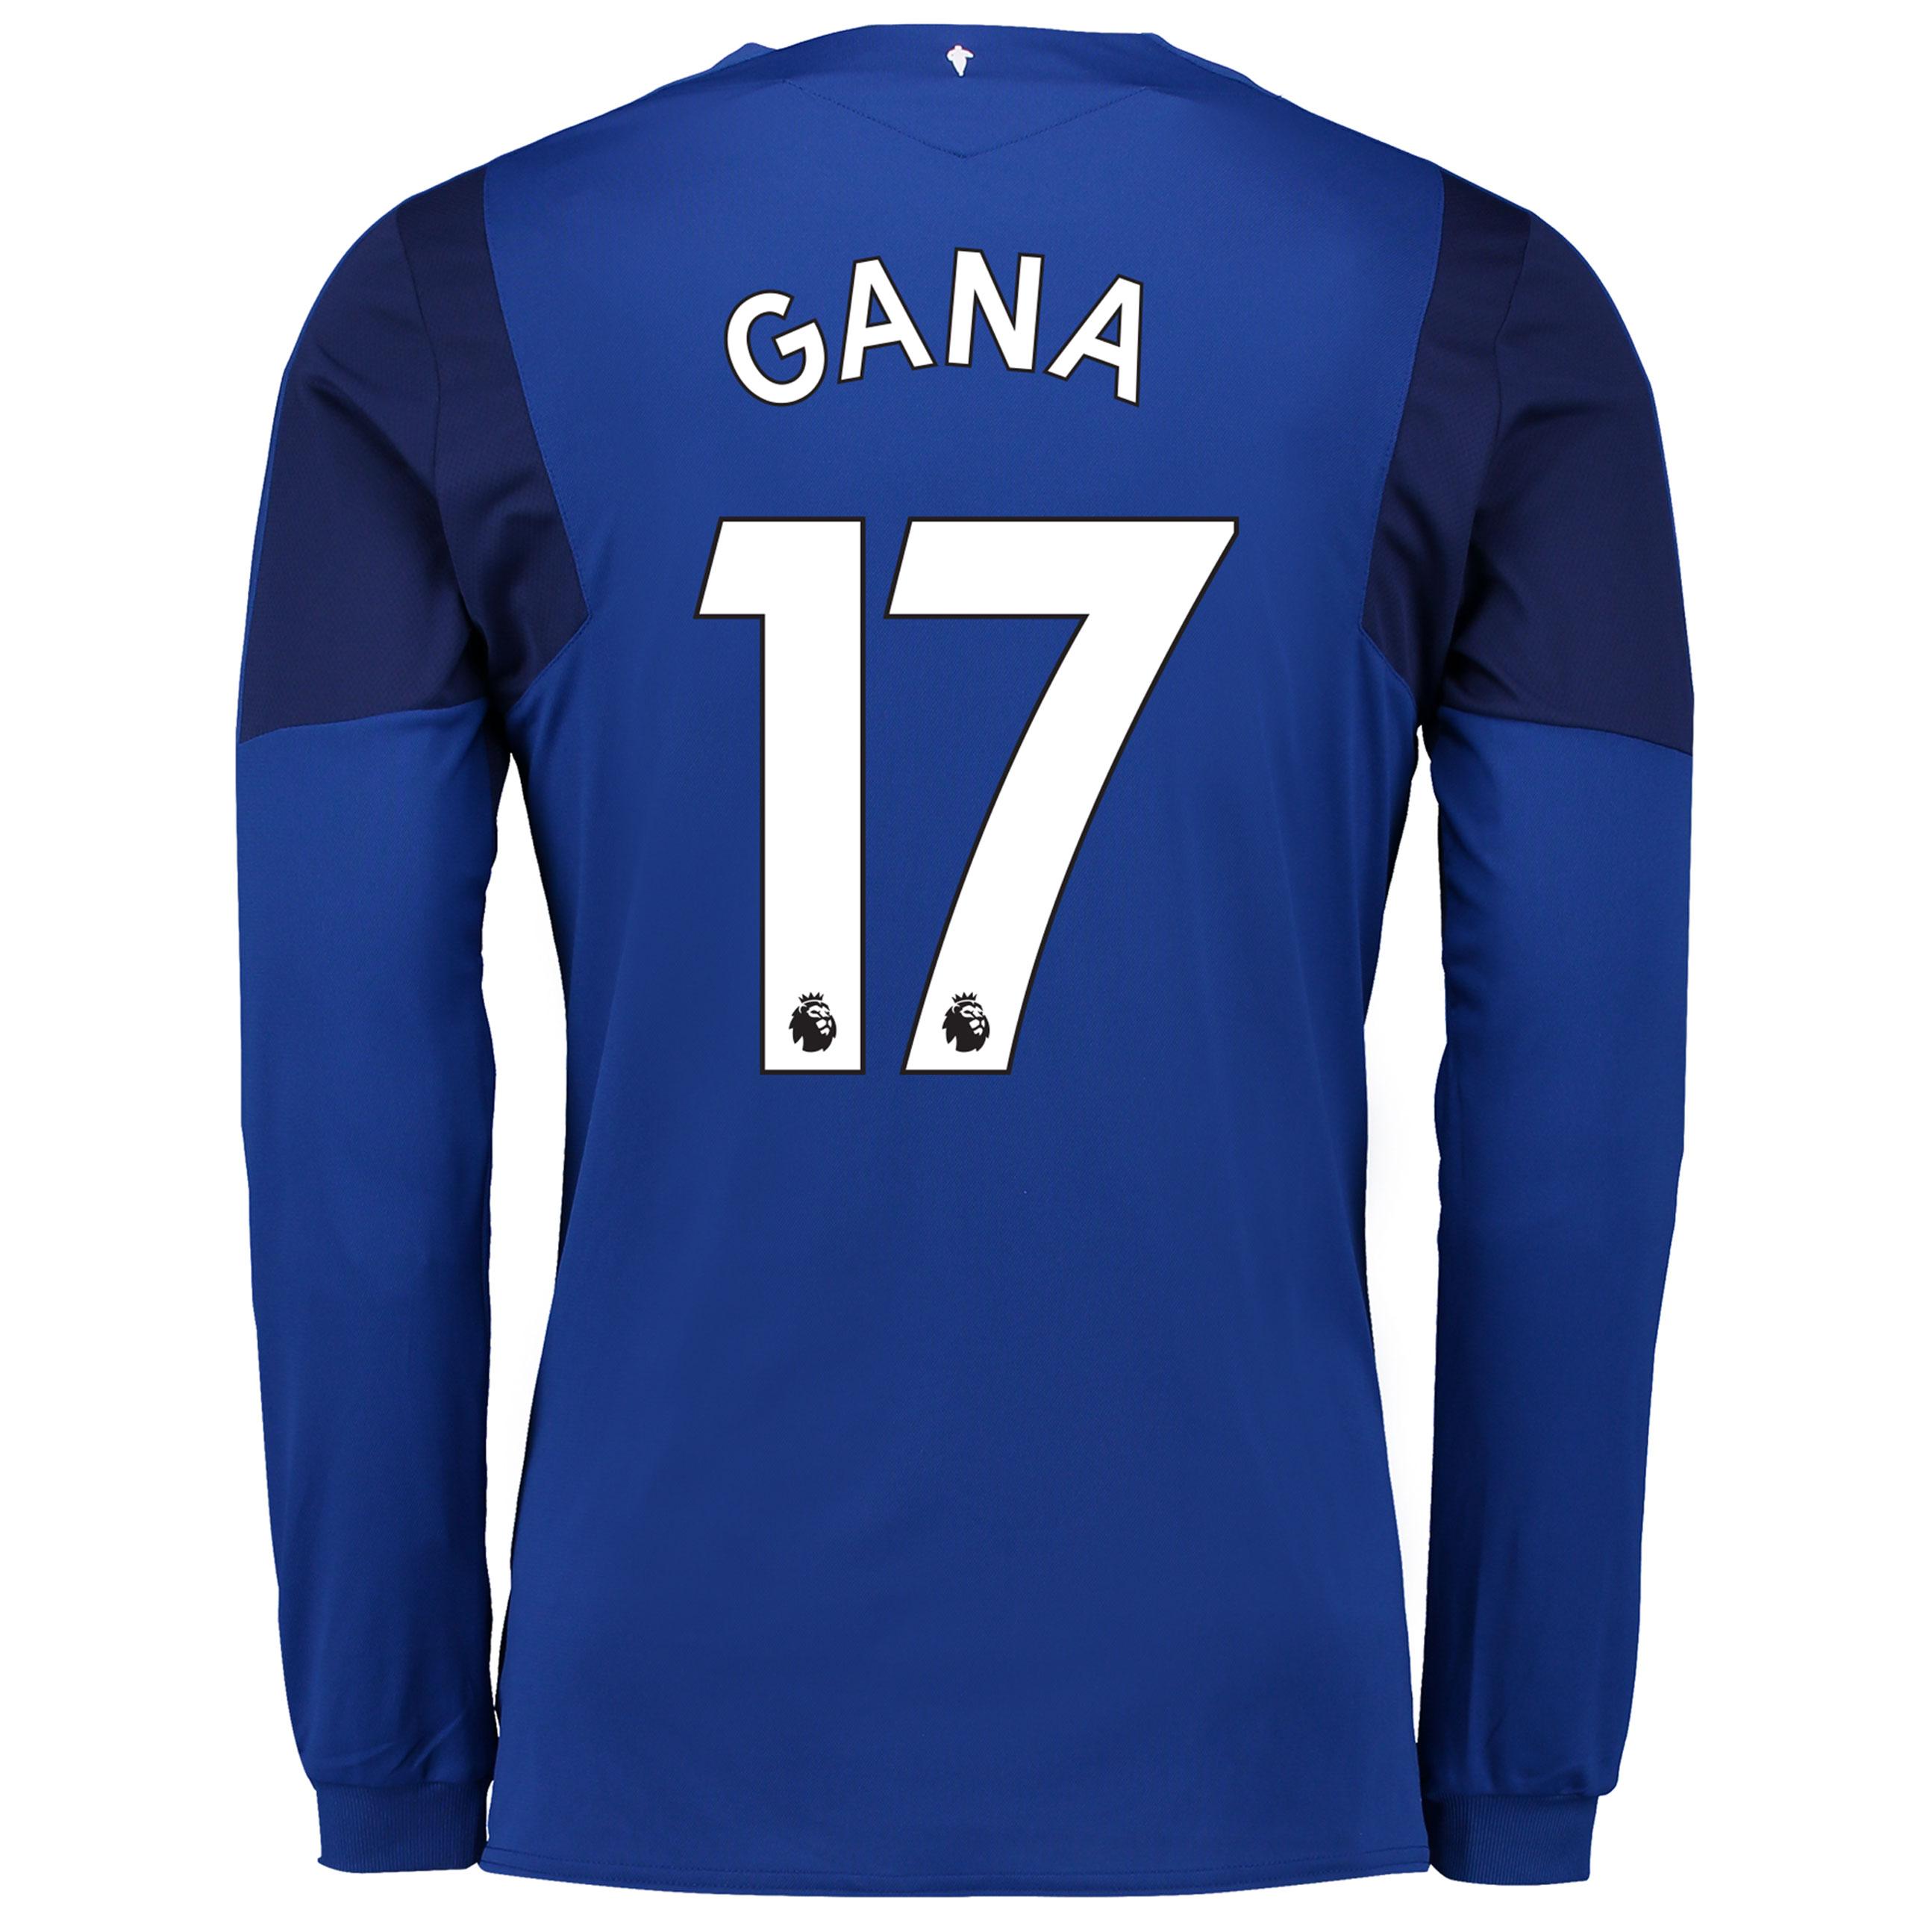 Everton Home Shirt 2017/18 - Long Sleeved with Gana 17 printing